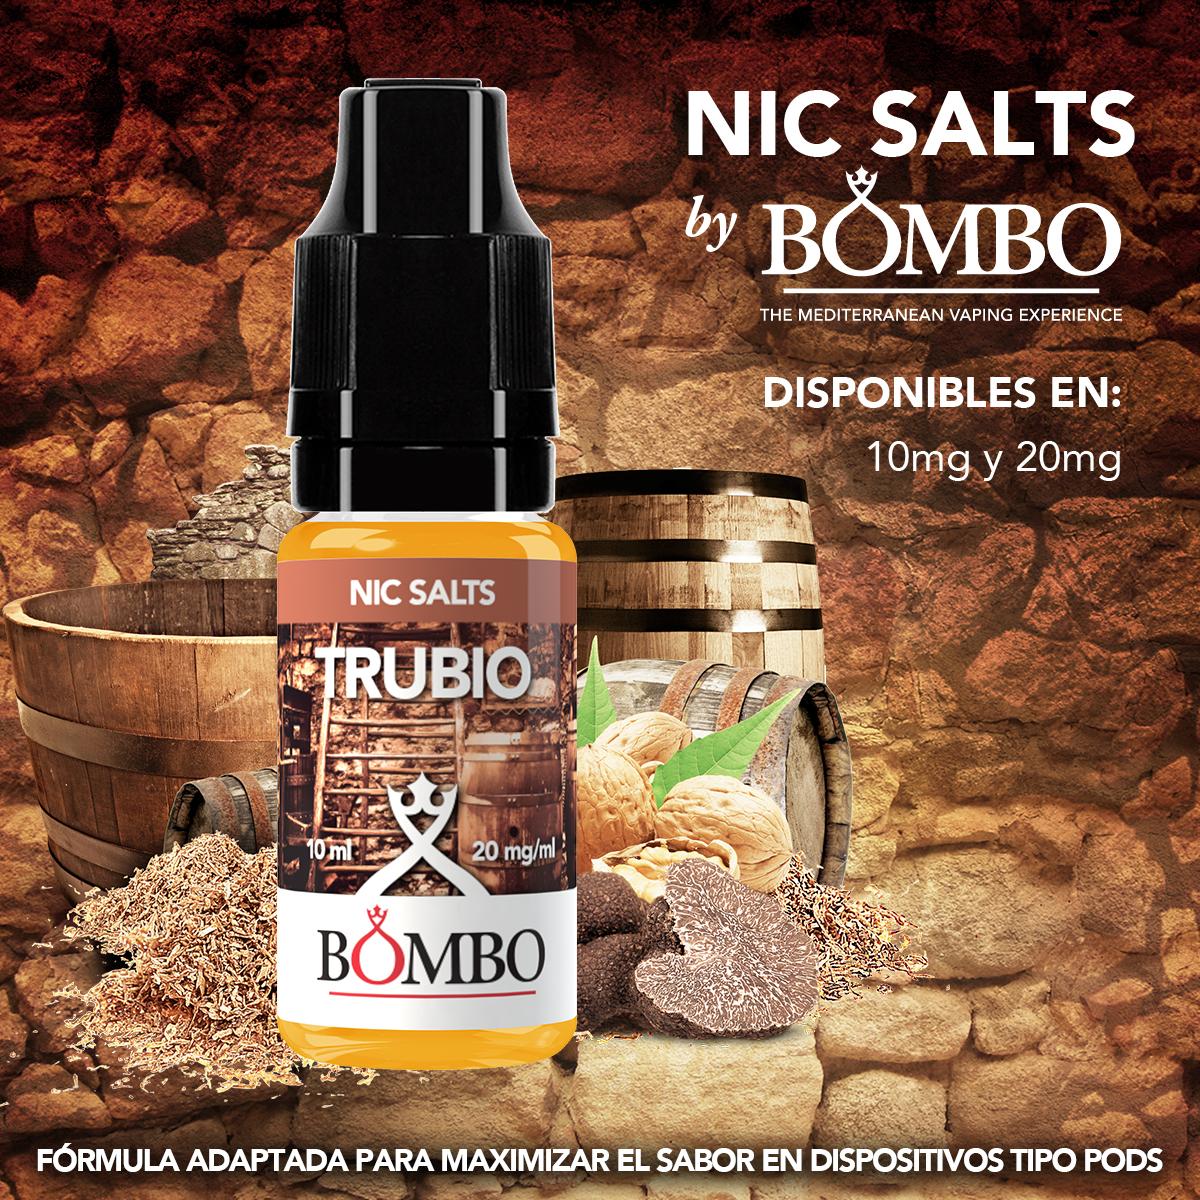 trubio nic salts bombo eliquids sales de nicotina